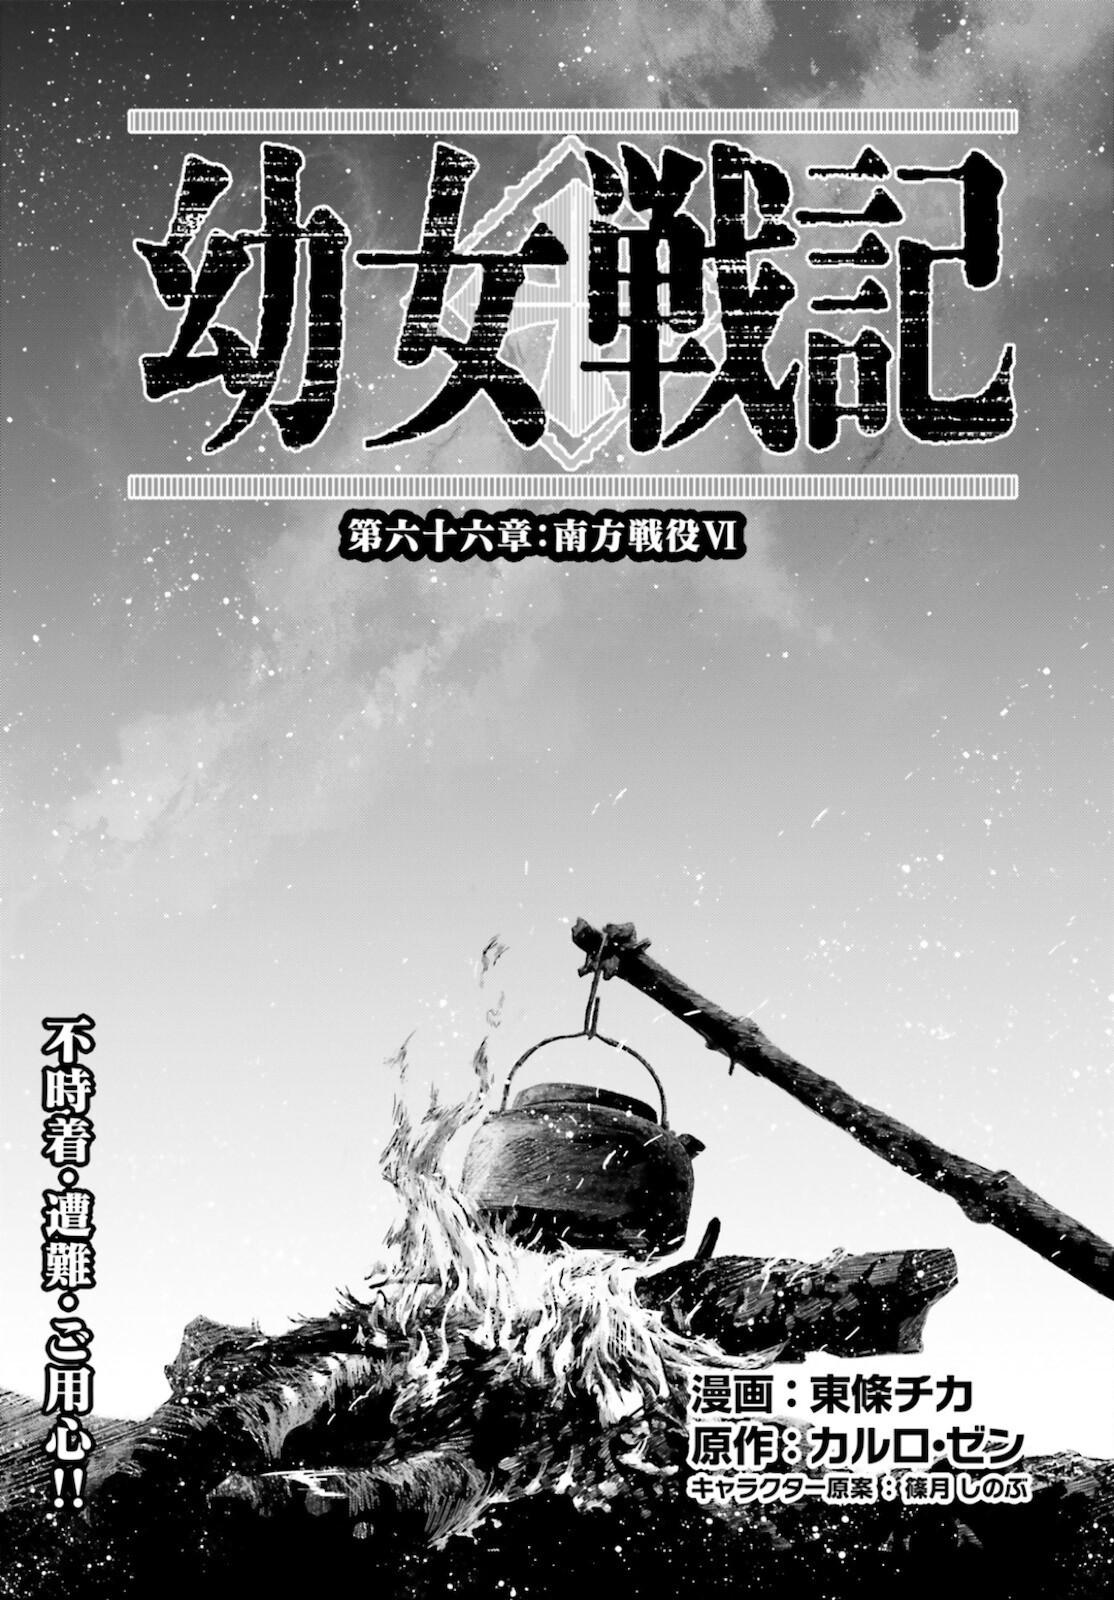 Youjo Senki - Chapter 66 - Page 1